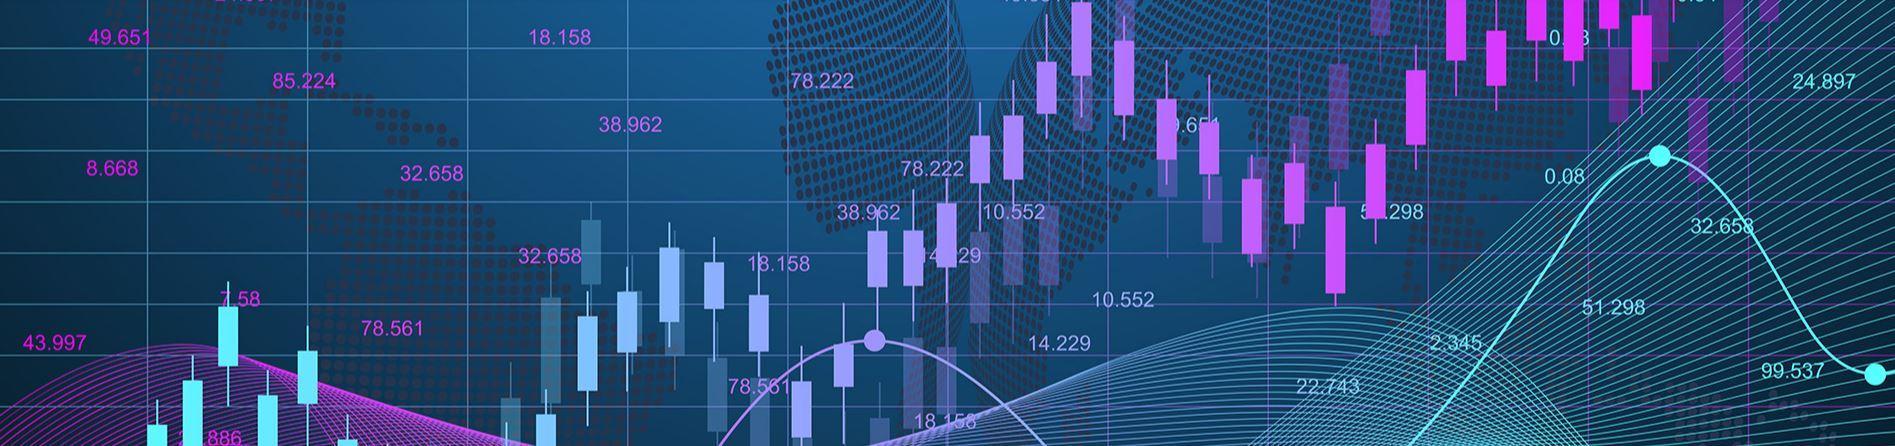 Can a Stock Market Selloff Be a Good Thing? Thumbnail